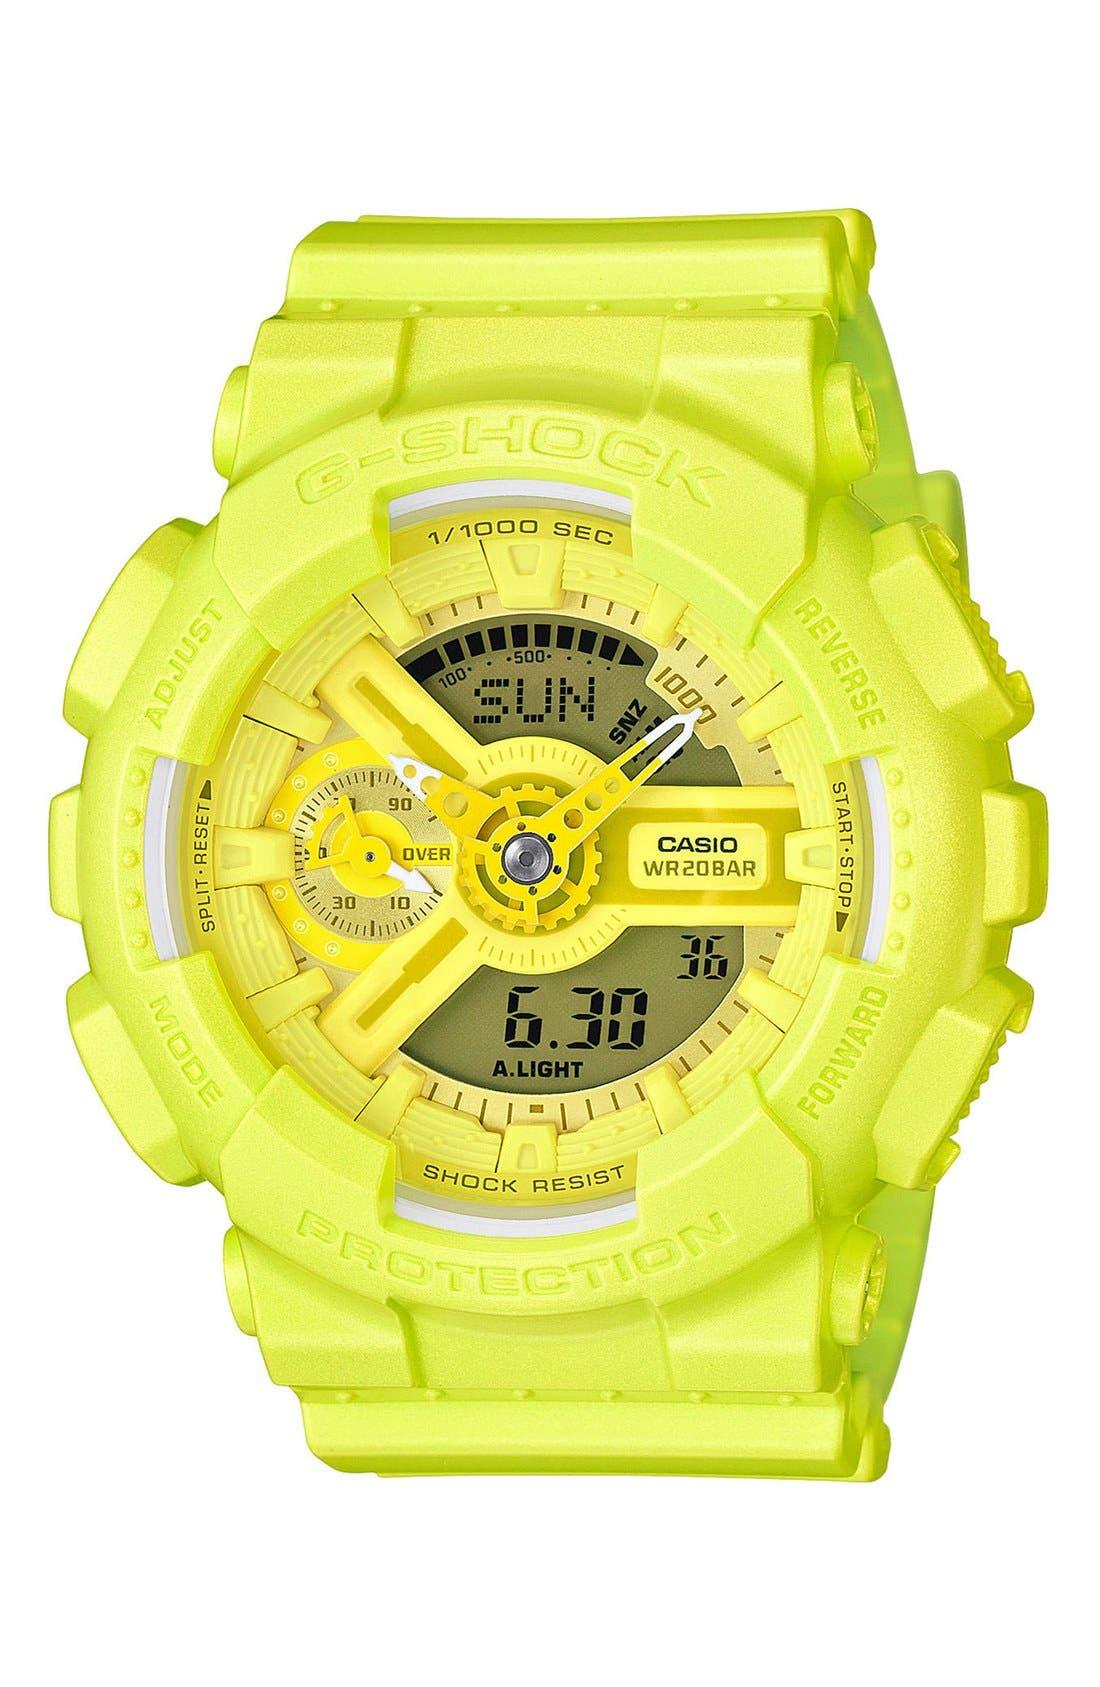 Main Image - G-Shock S-Series Ana-Digi Resin Watch, 49mm